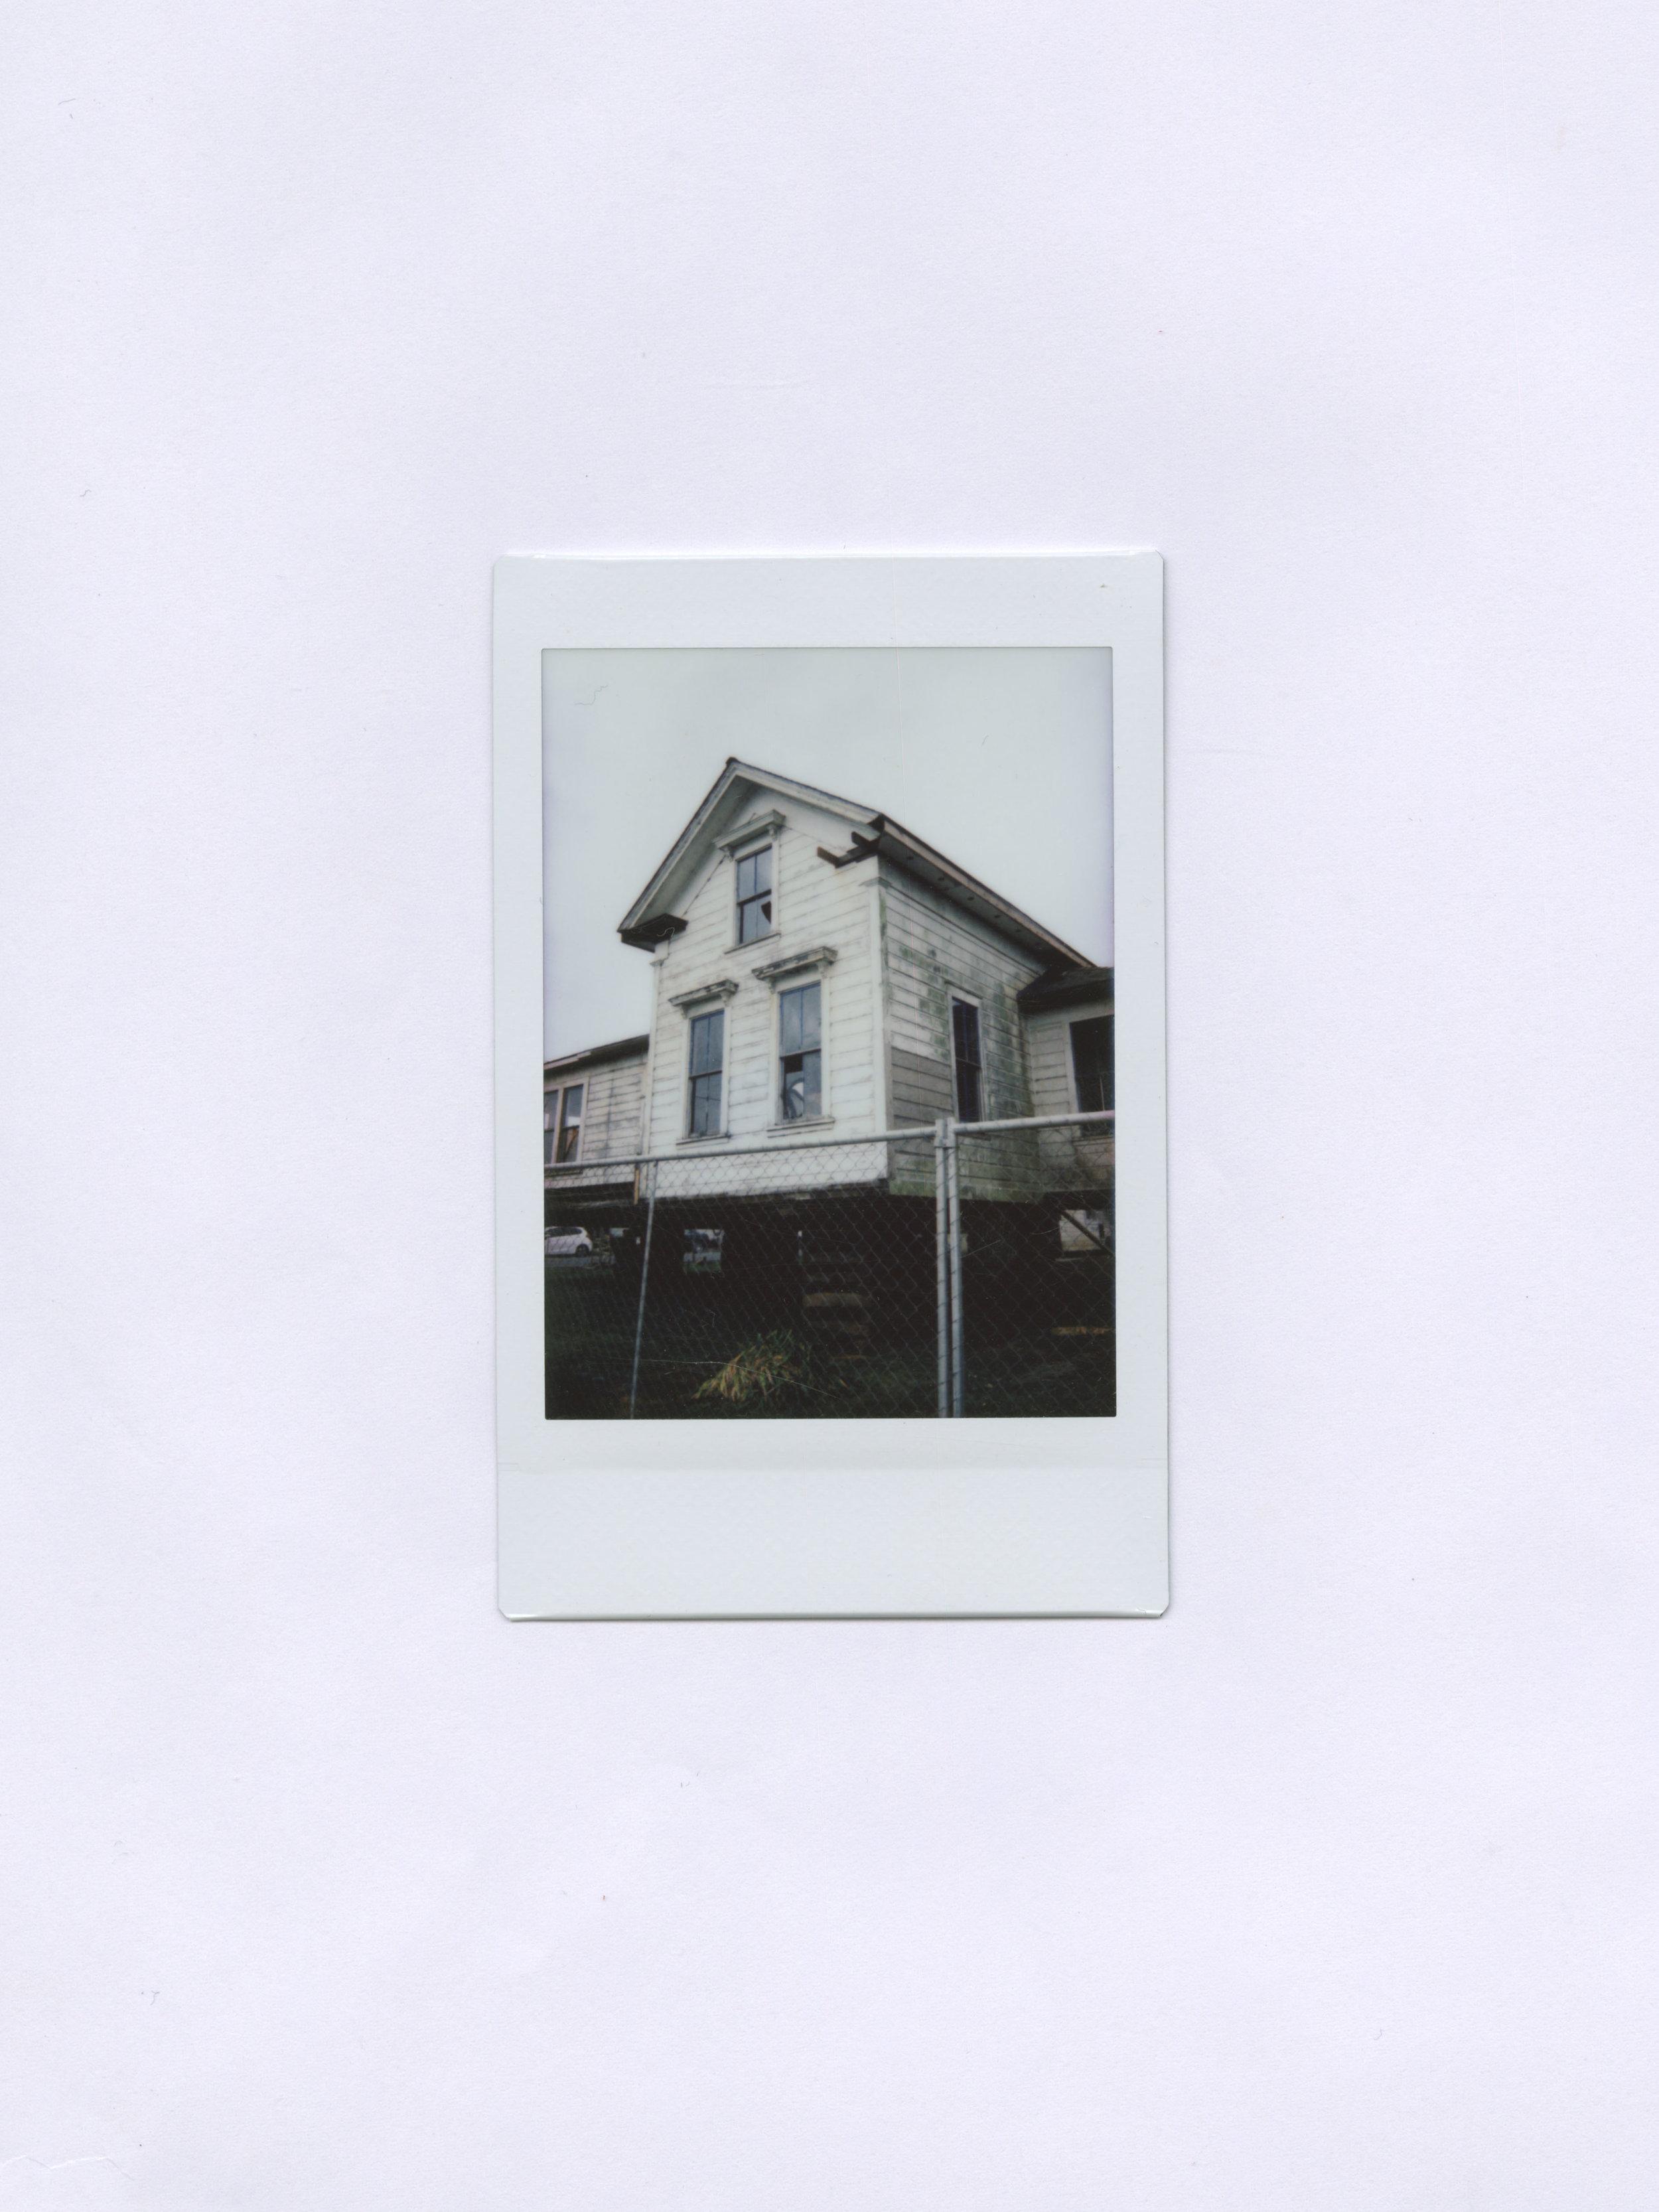 15.fdc215.jpg